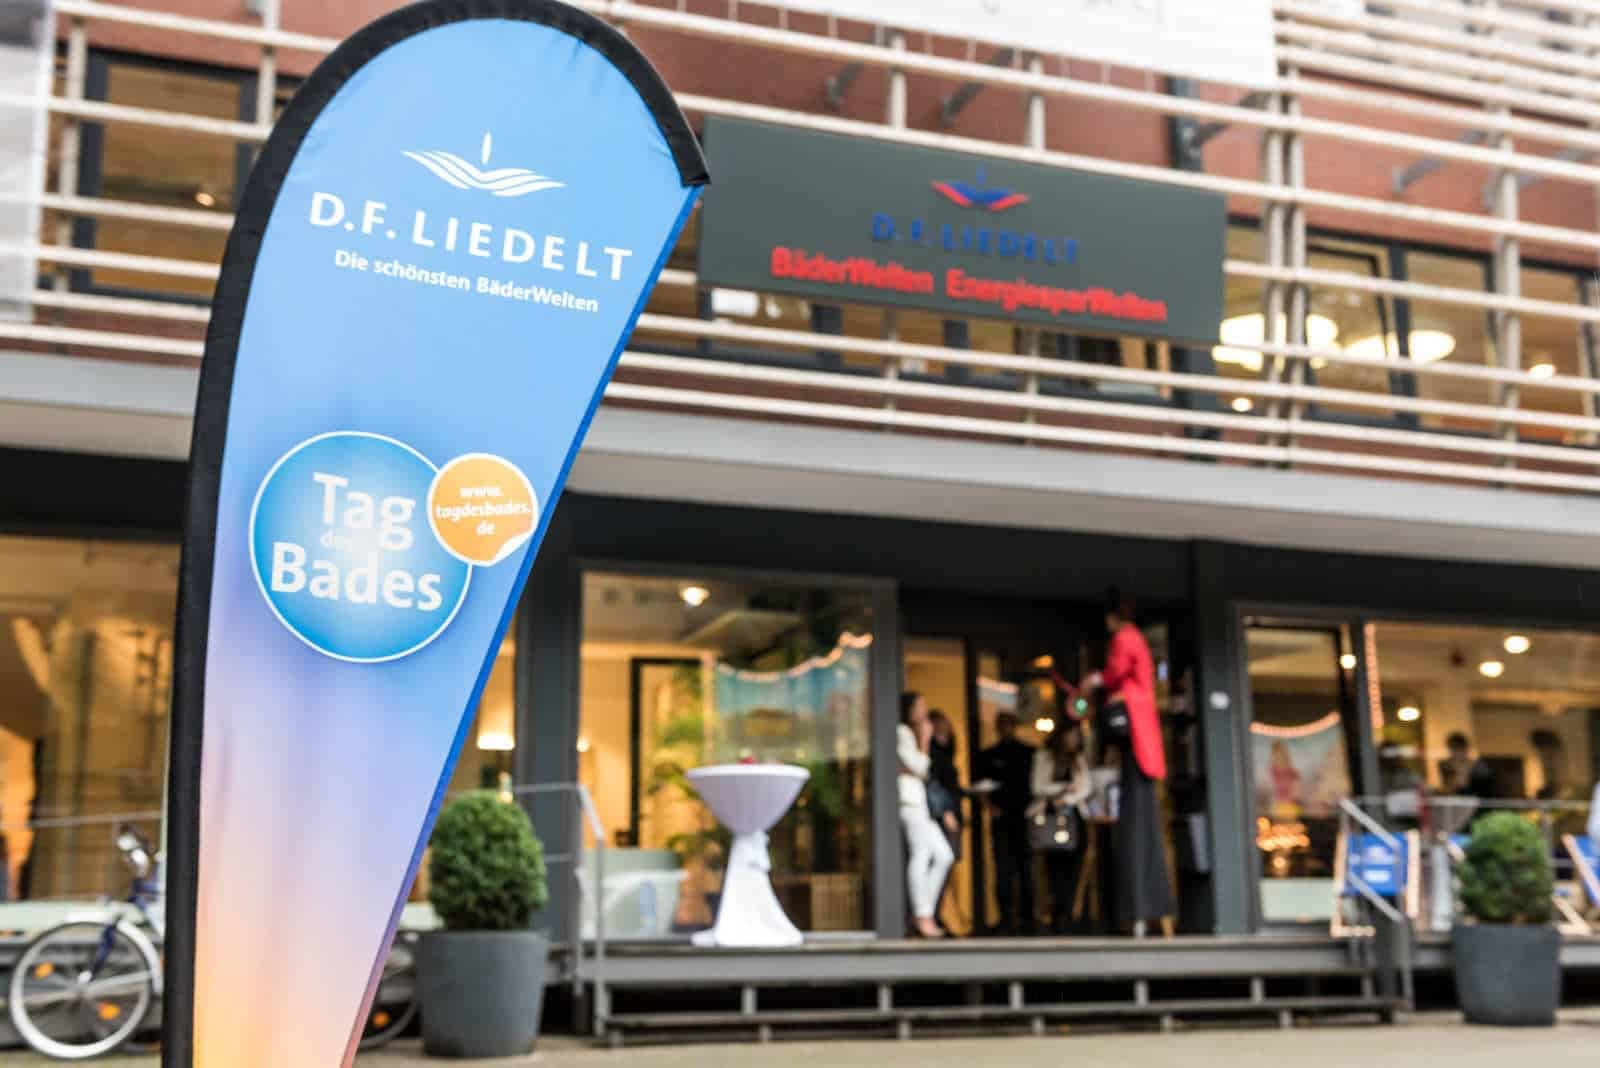 Eventfotograf Hamburg Verbandsarbeit Promi Tag des Bades